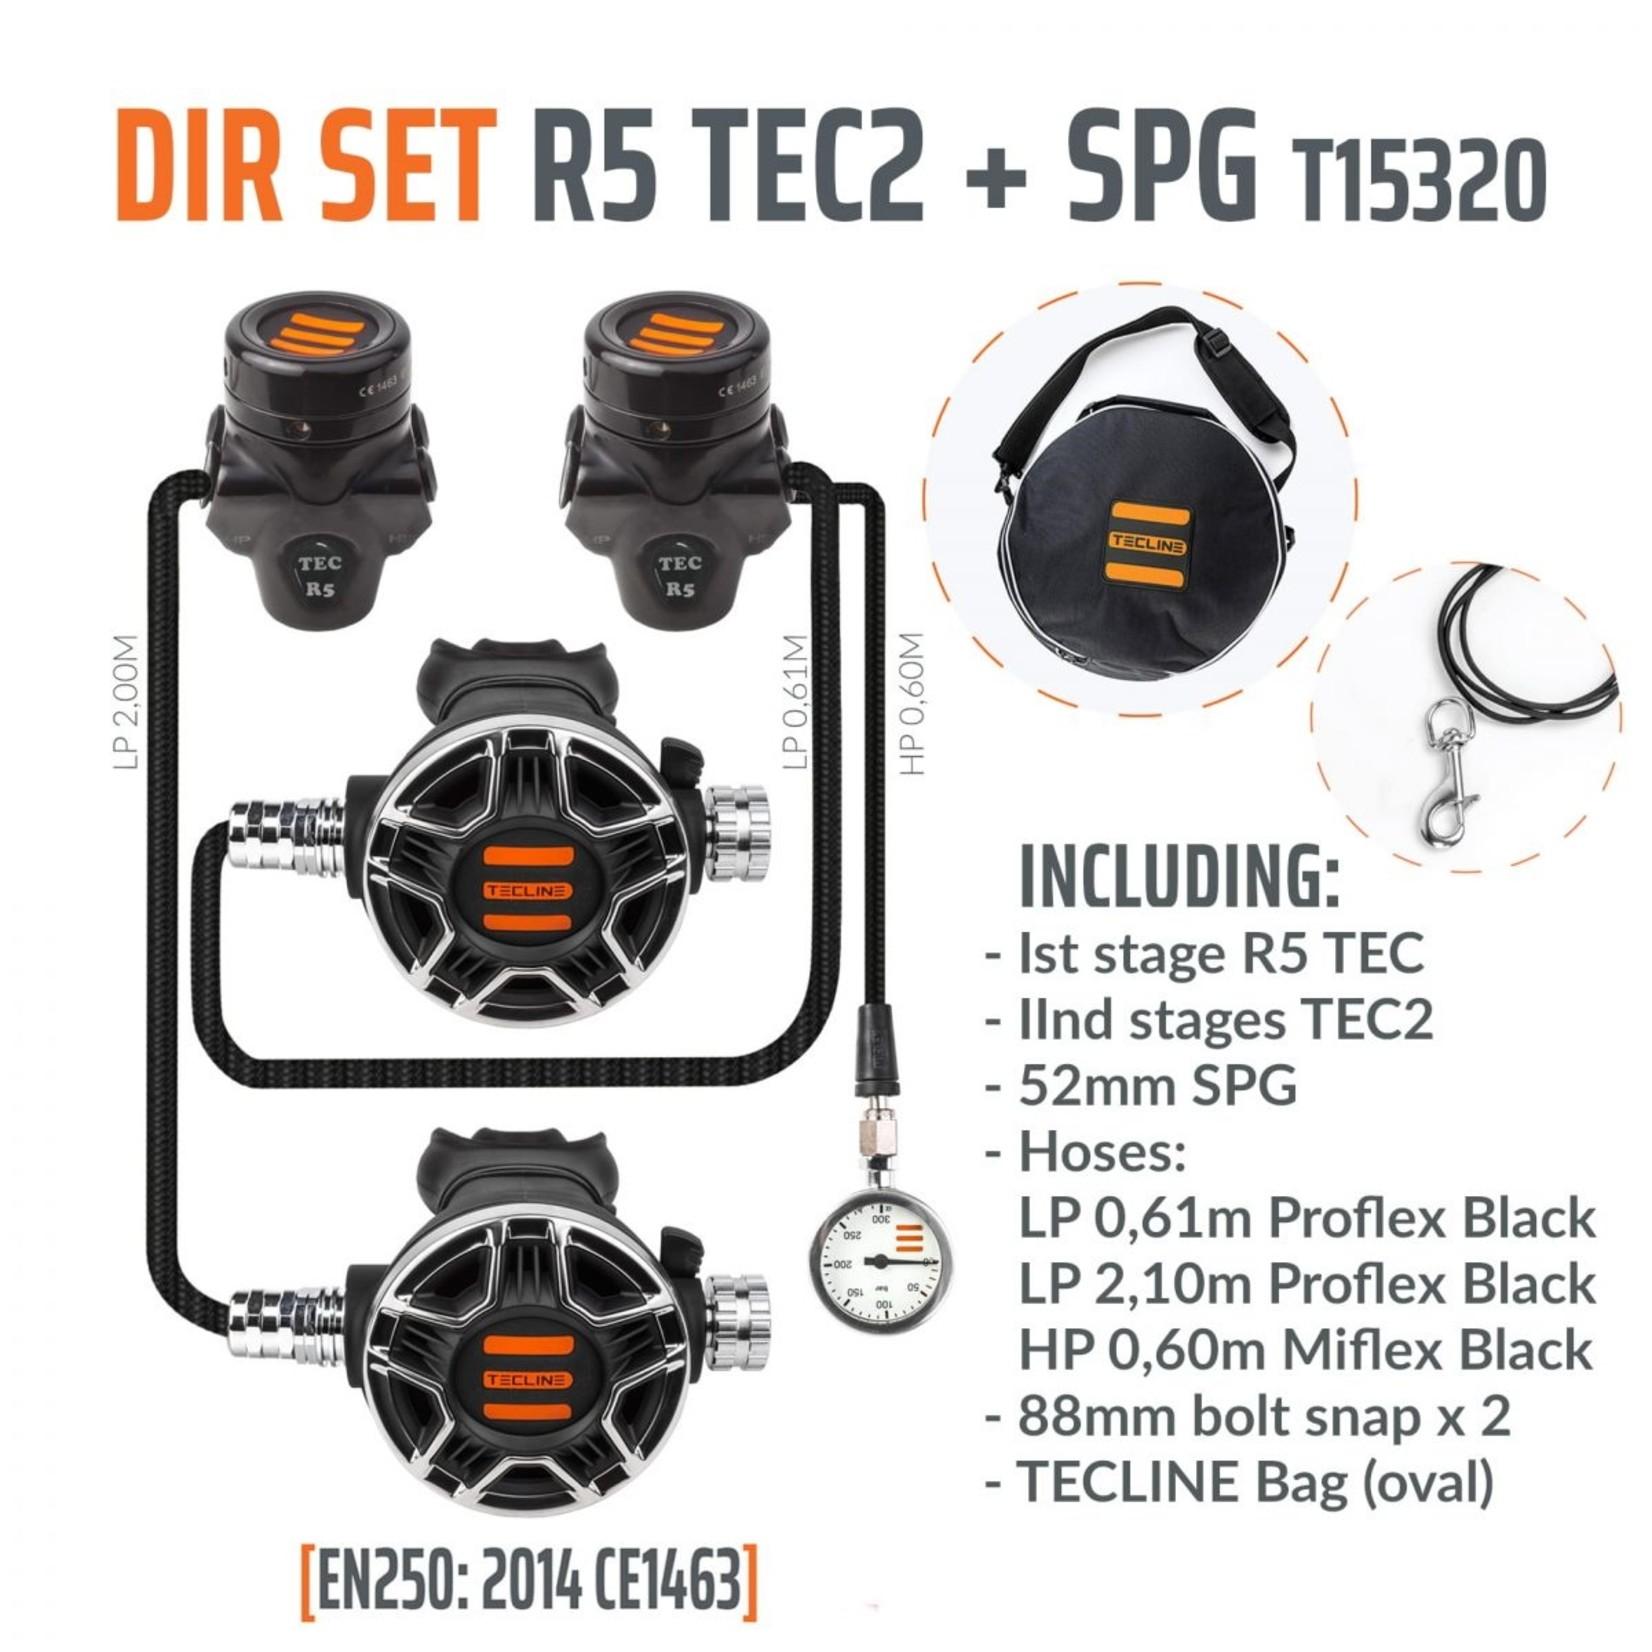 Tecline Regulator R5 TEC2 DIR Set with SPG - EN250A